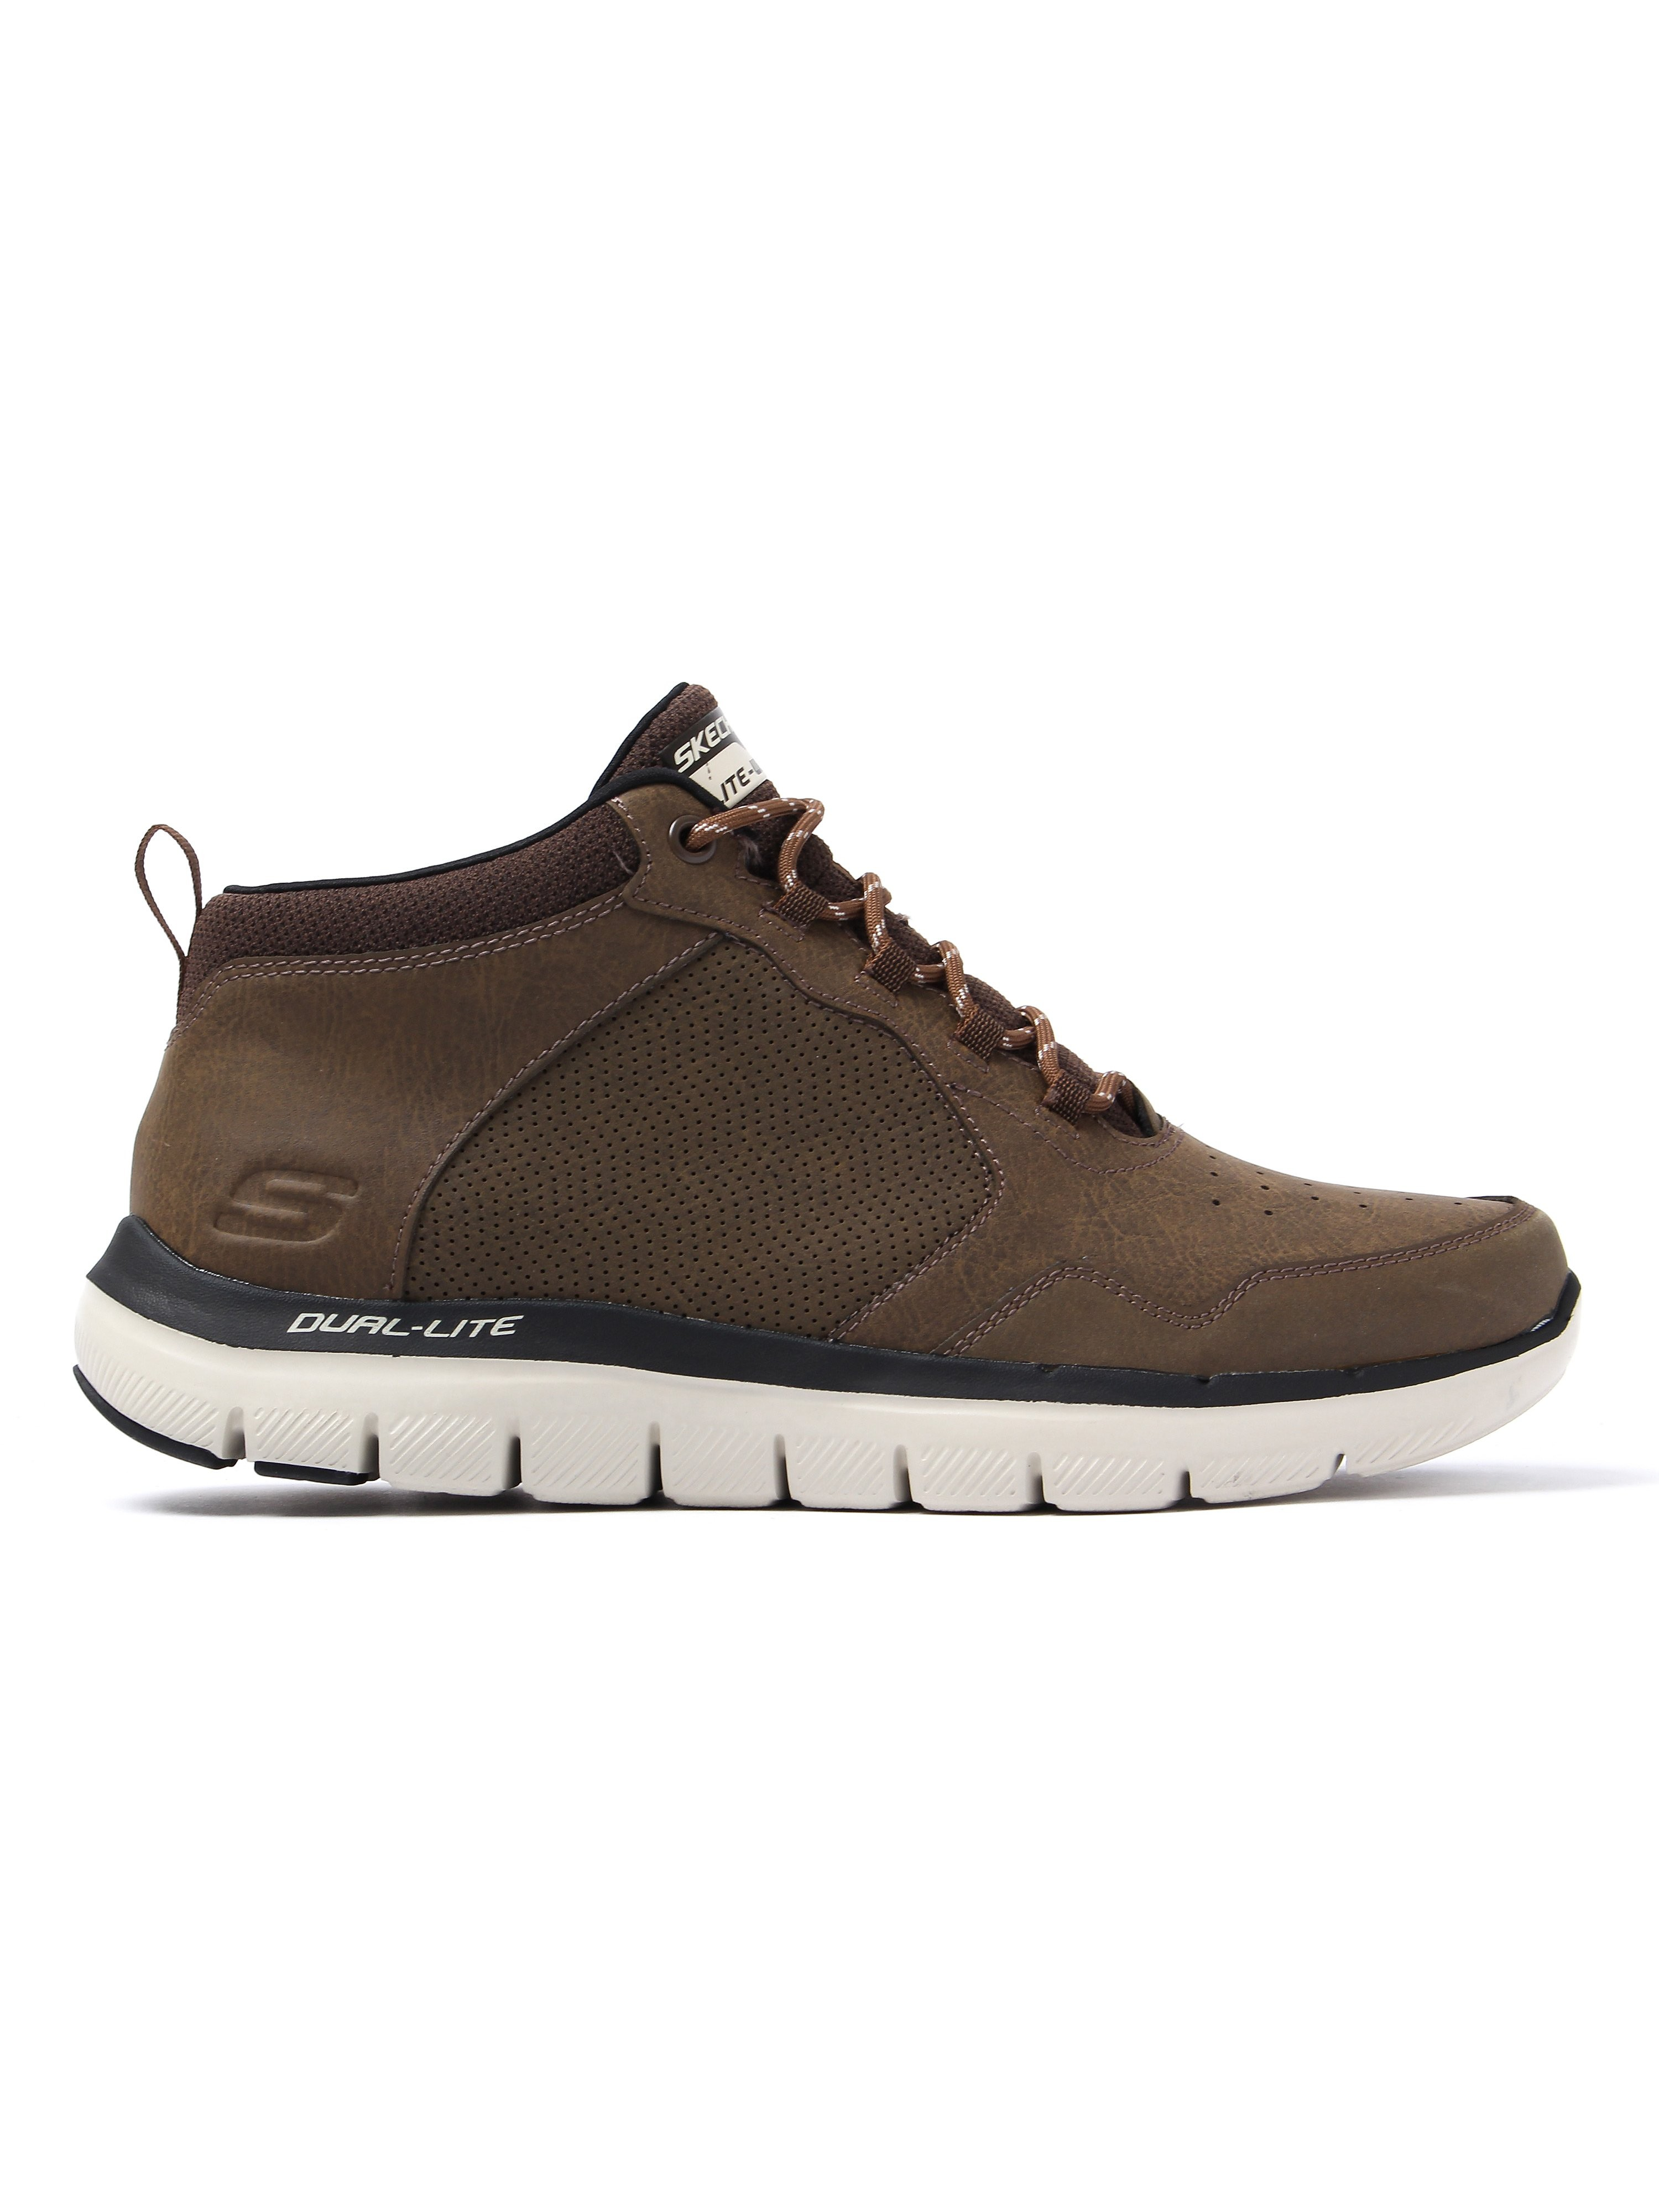 Skechers Men's Flex Advantage 2.0 High Key Trainers - Chocolate Leather